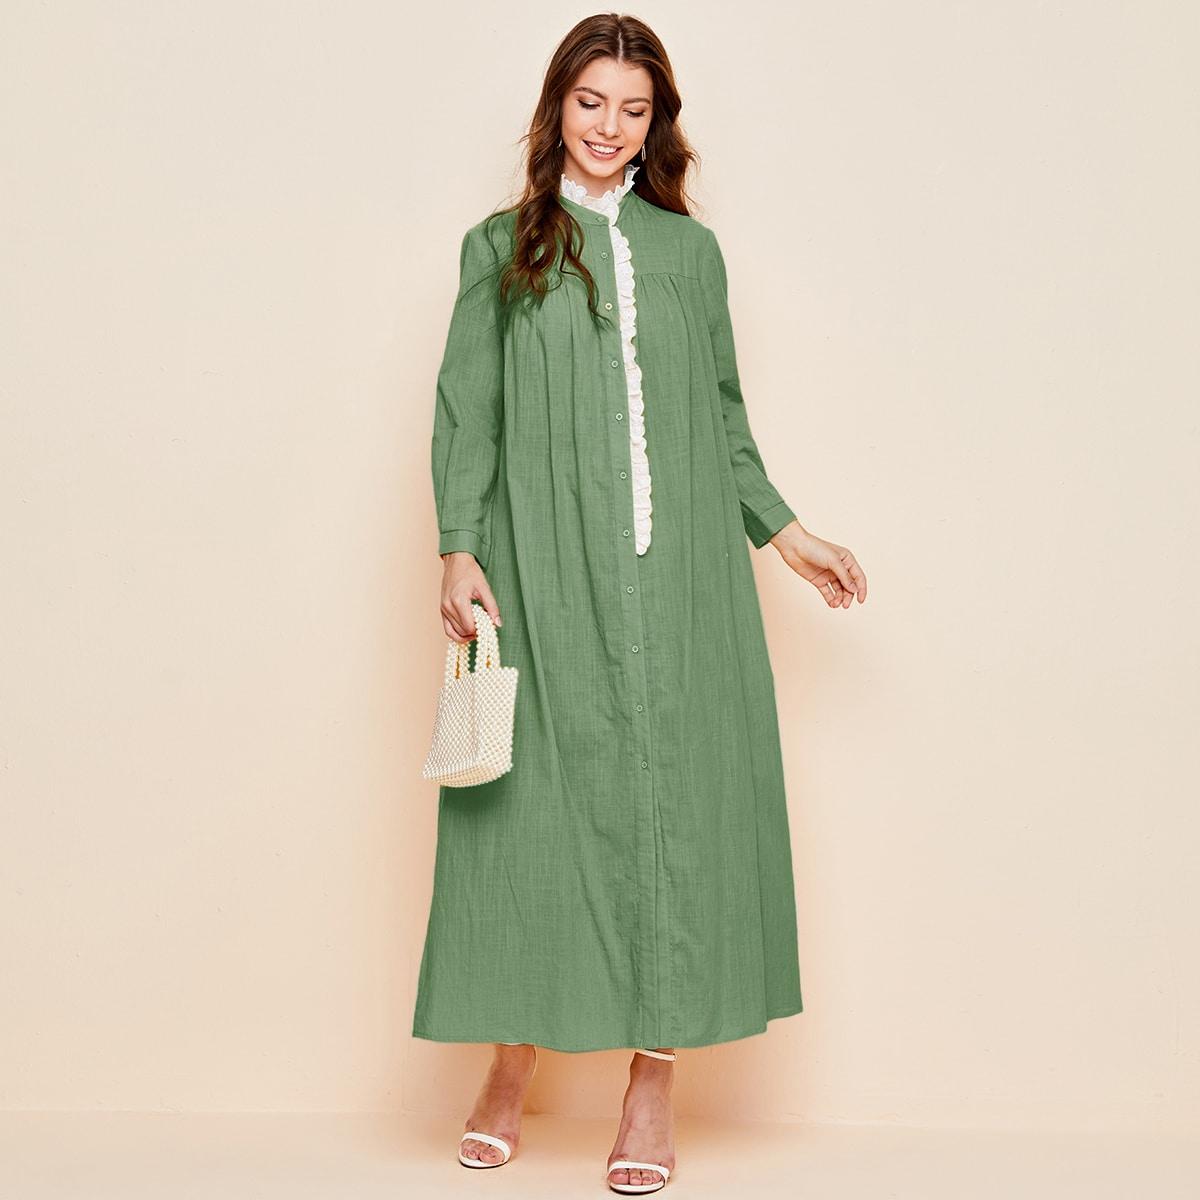 Макси платье с оборками